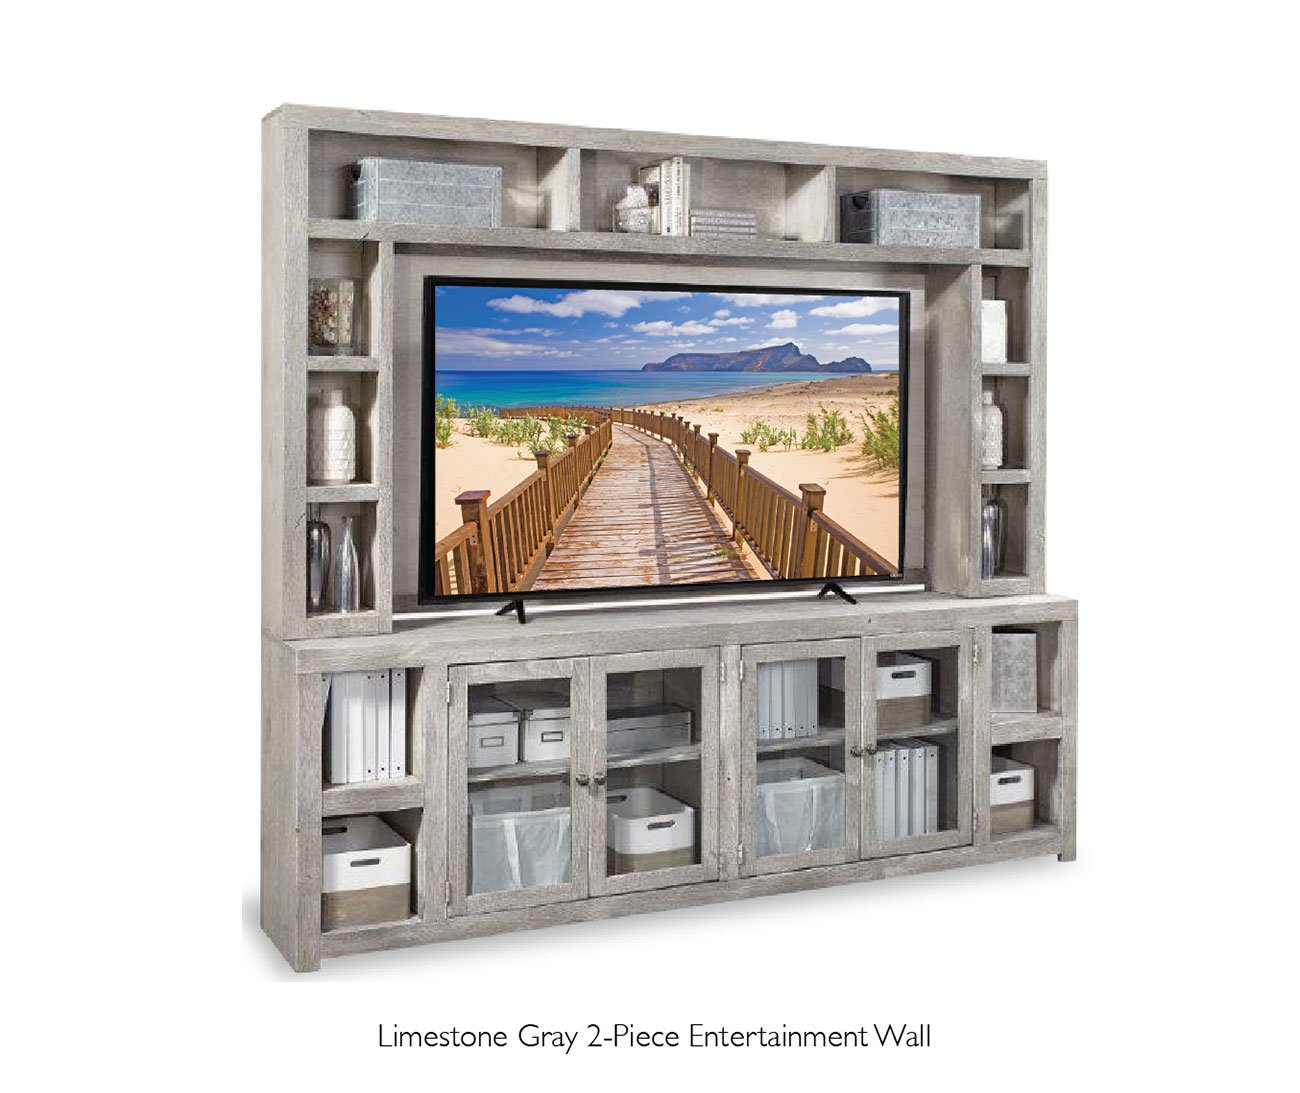 Limestone-gray-entertainment-wall